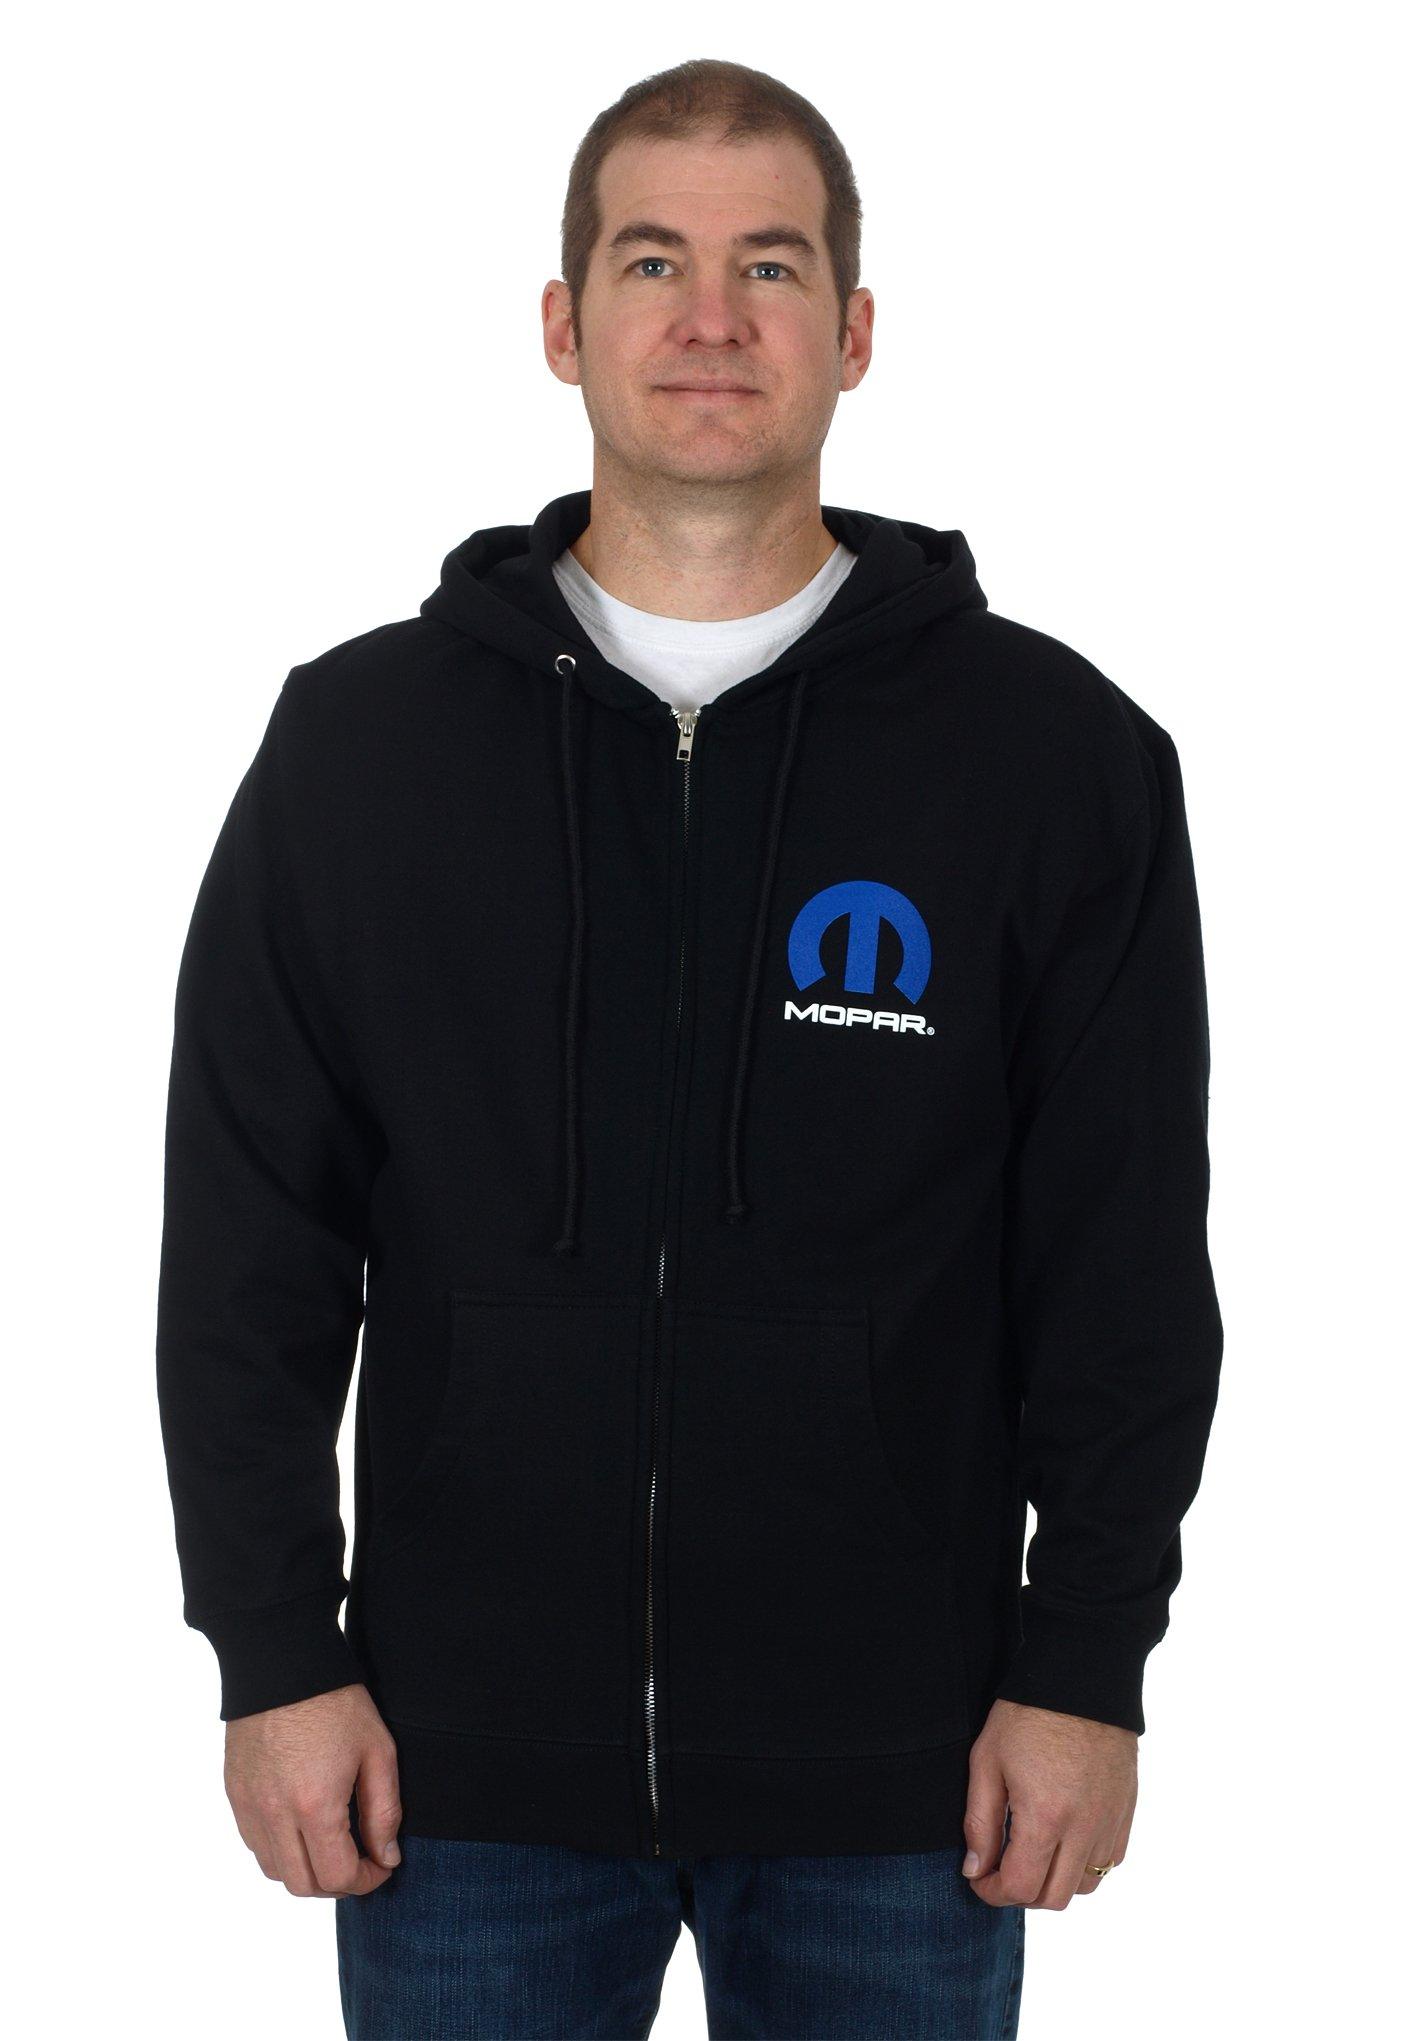 Mens MOPAR Zip Up Hoodie XL product image